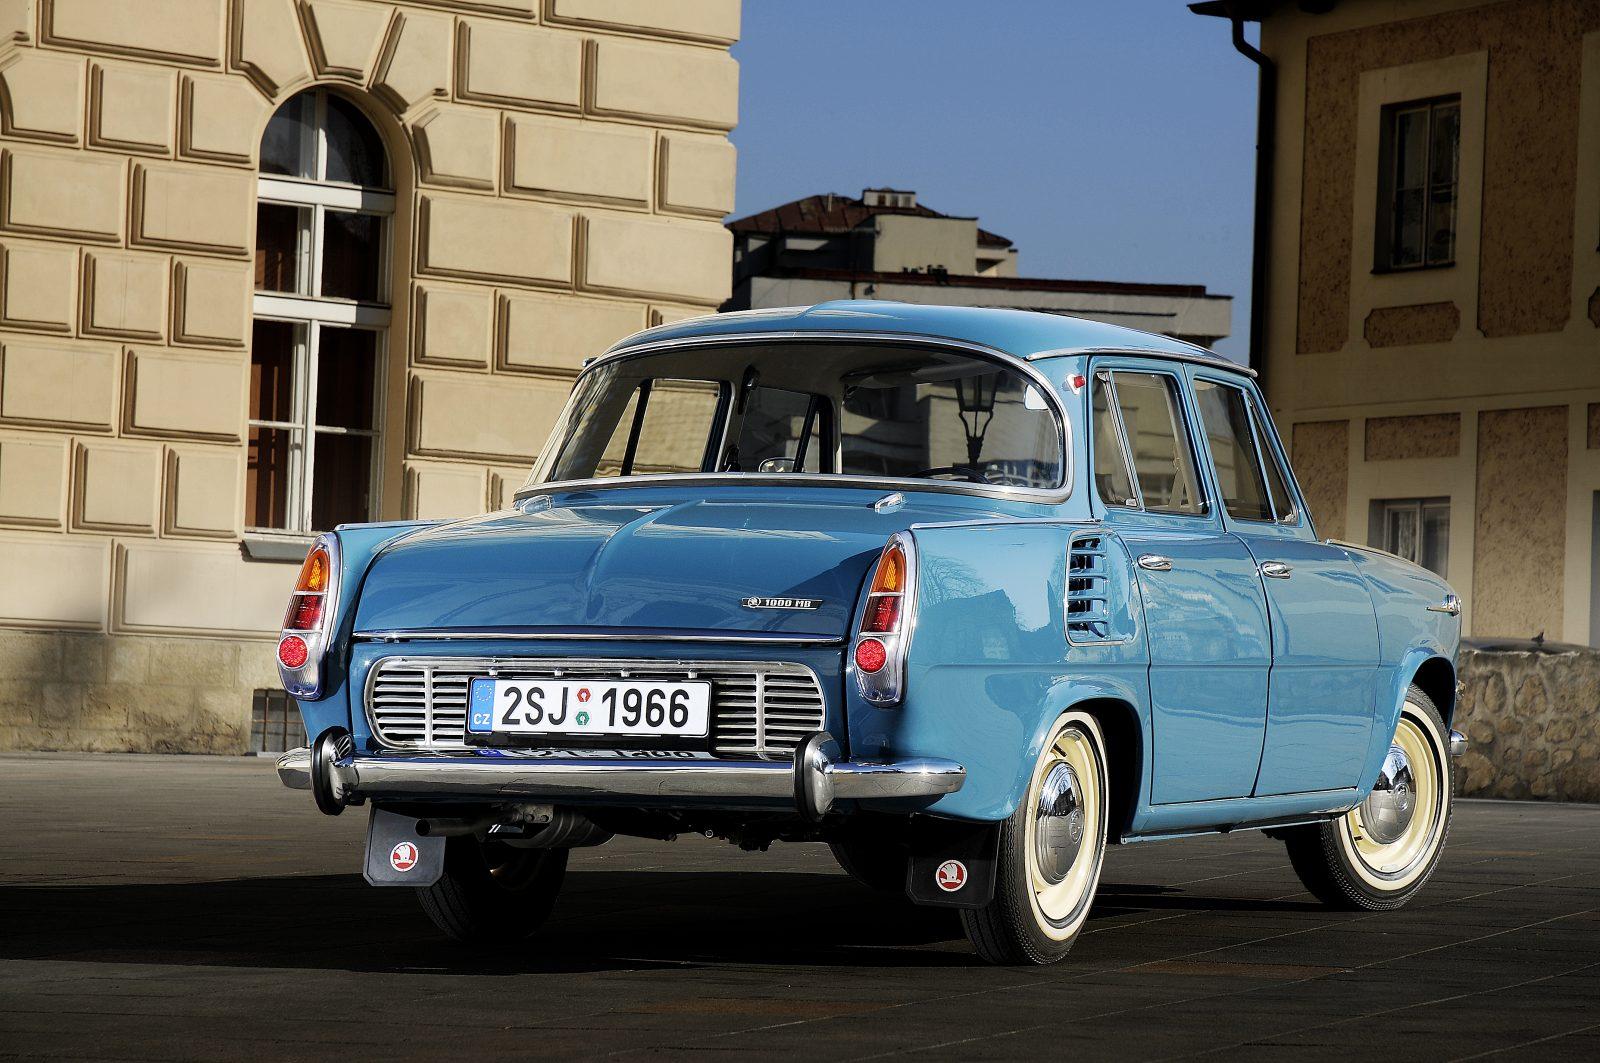 Modrá Škoda 1000 MB - embéčko